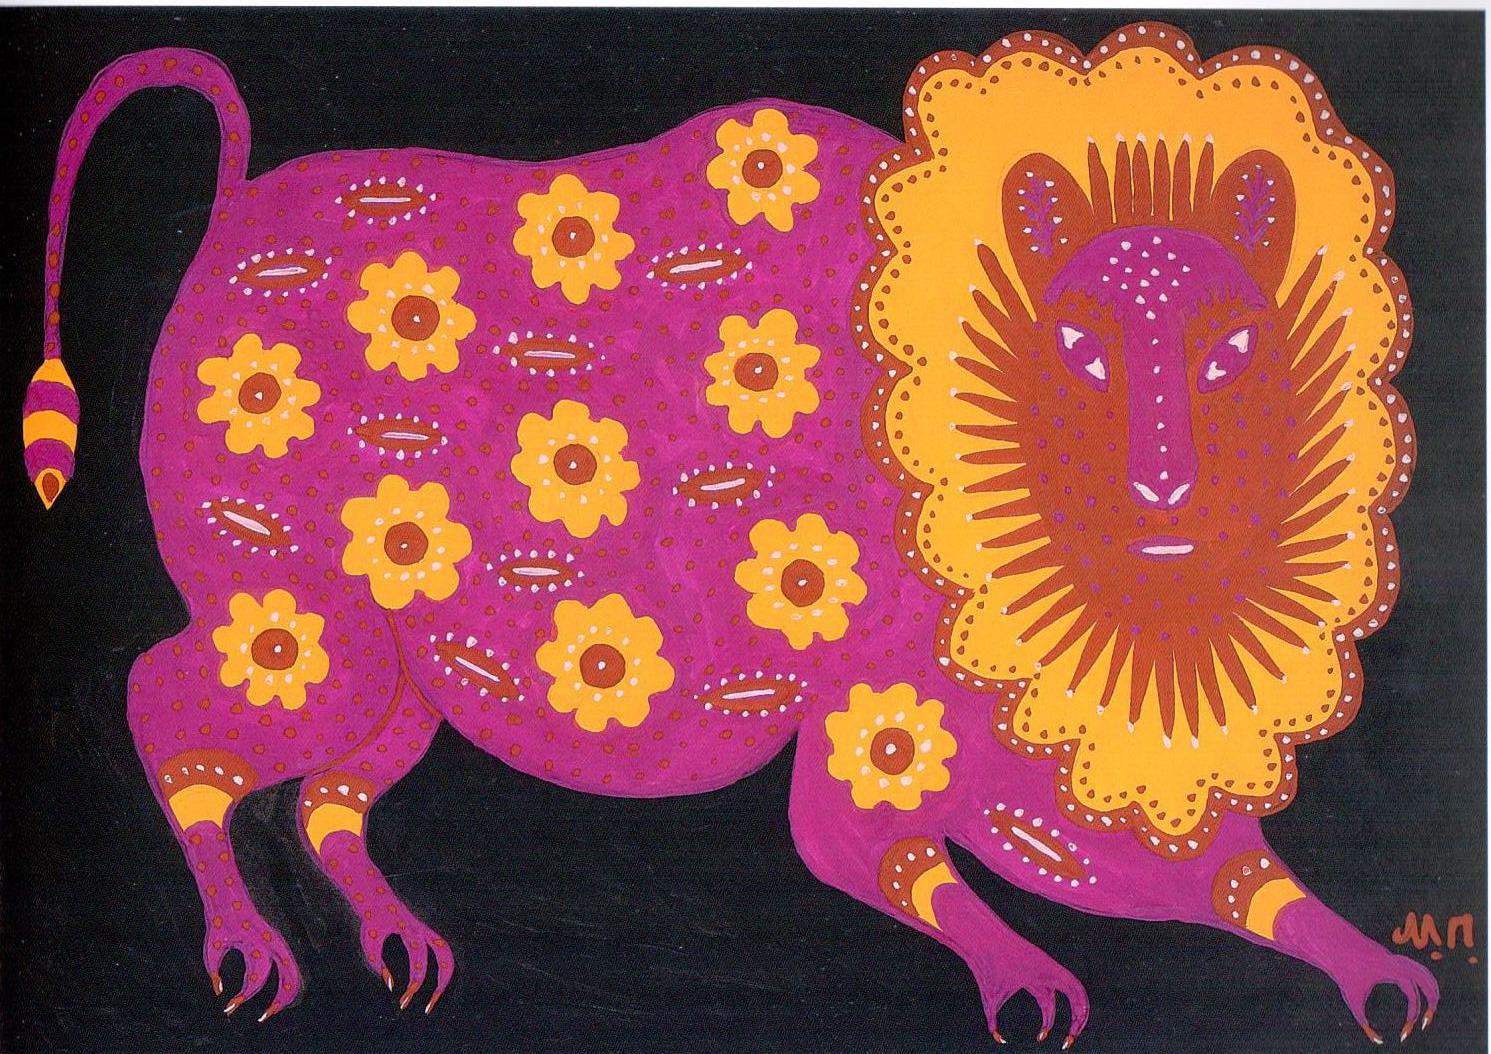 Young Lion, Maria Prymachenko, pink, ideas for Marimekko, folk art, naive